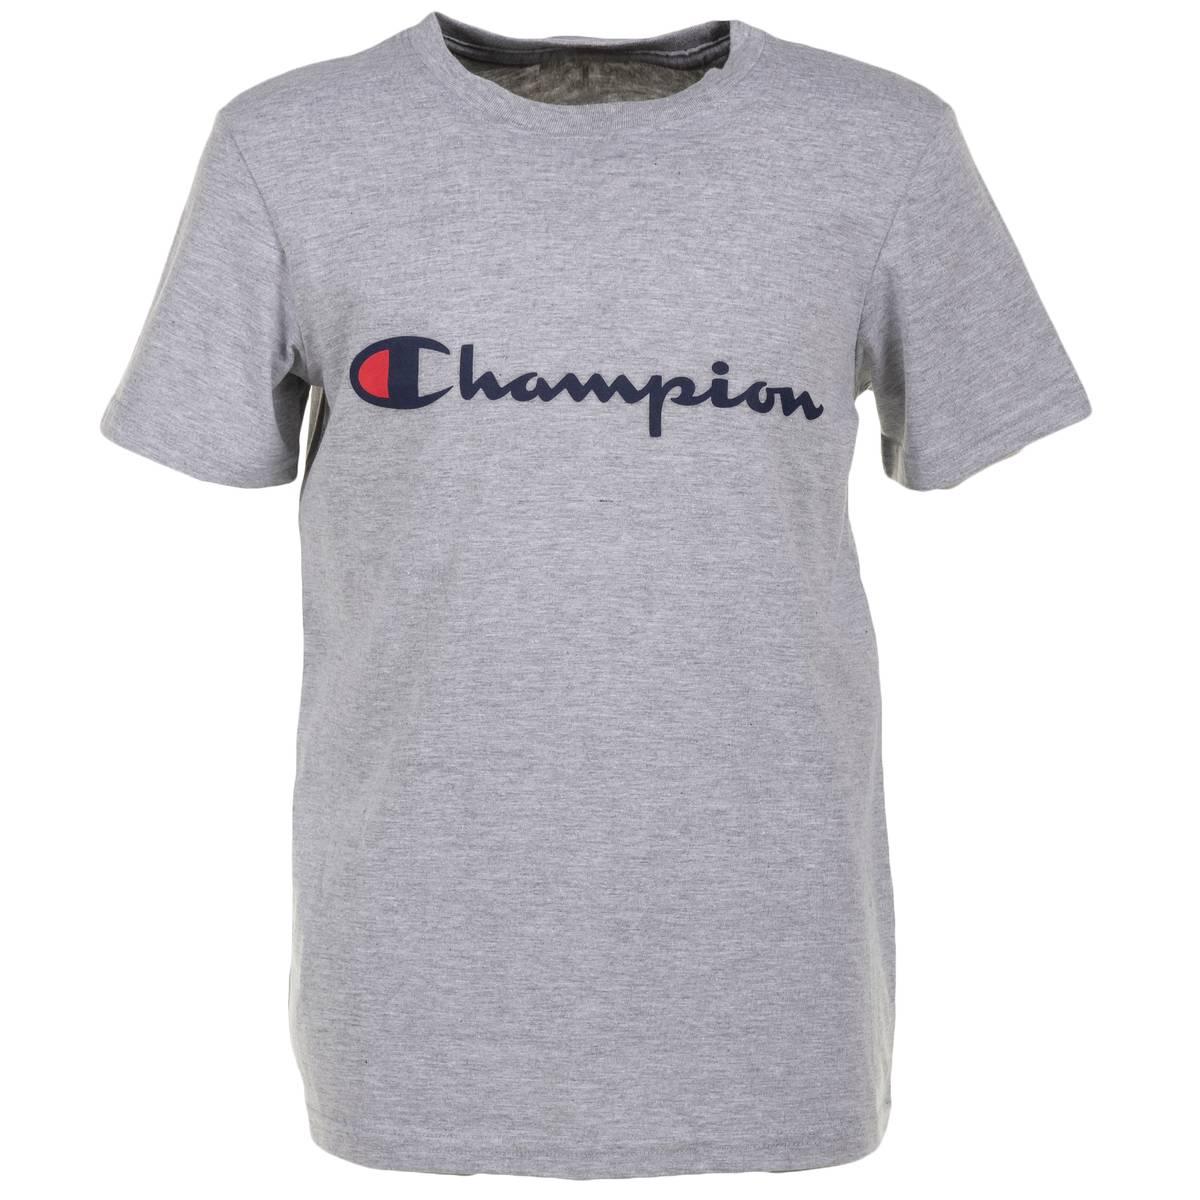 169704b3e BELUGA INC (Champion) Boys' Short Sleeve Logo Tee